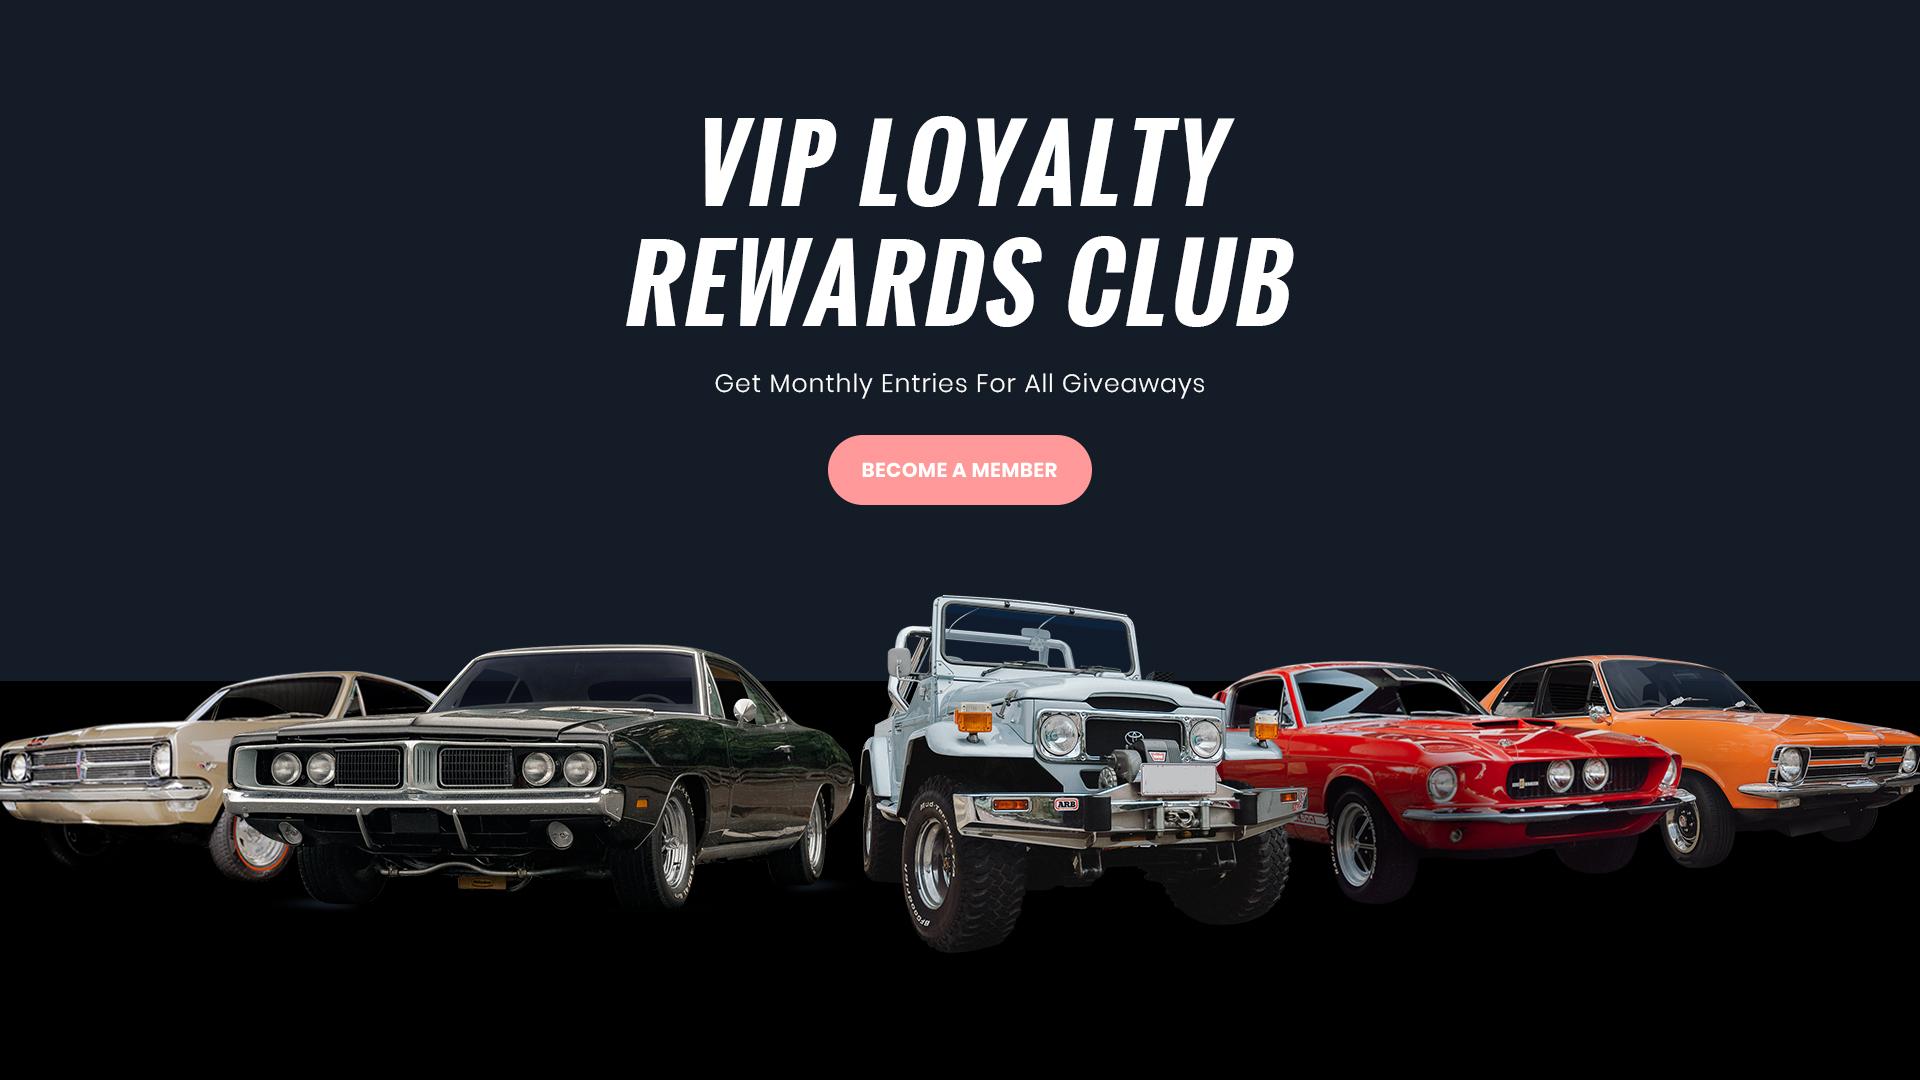 VIP Loyalty Rewards Club - Become a Member